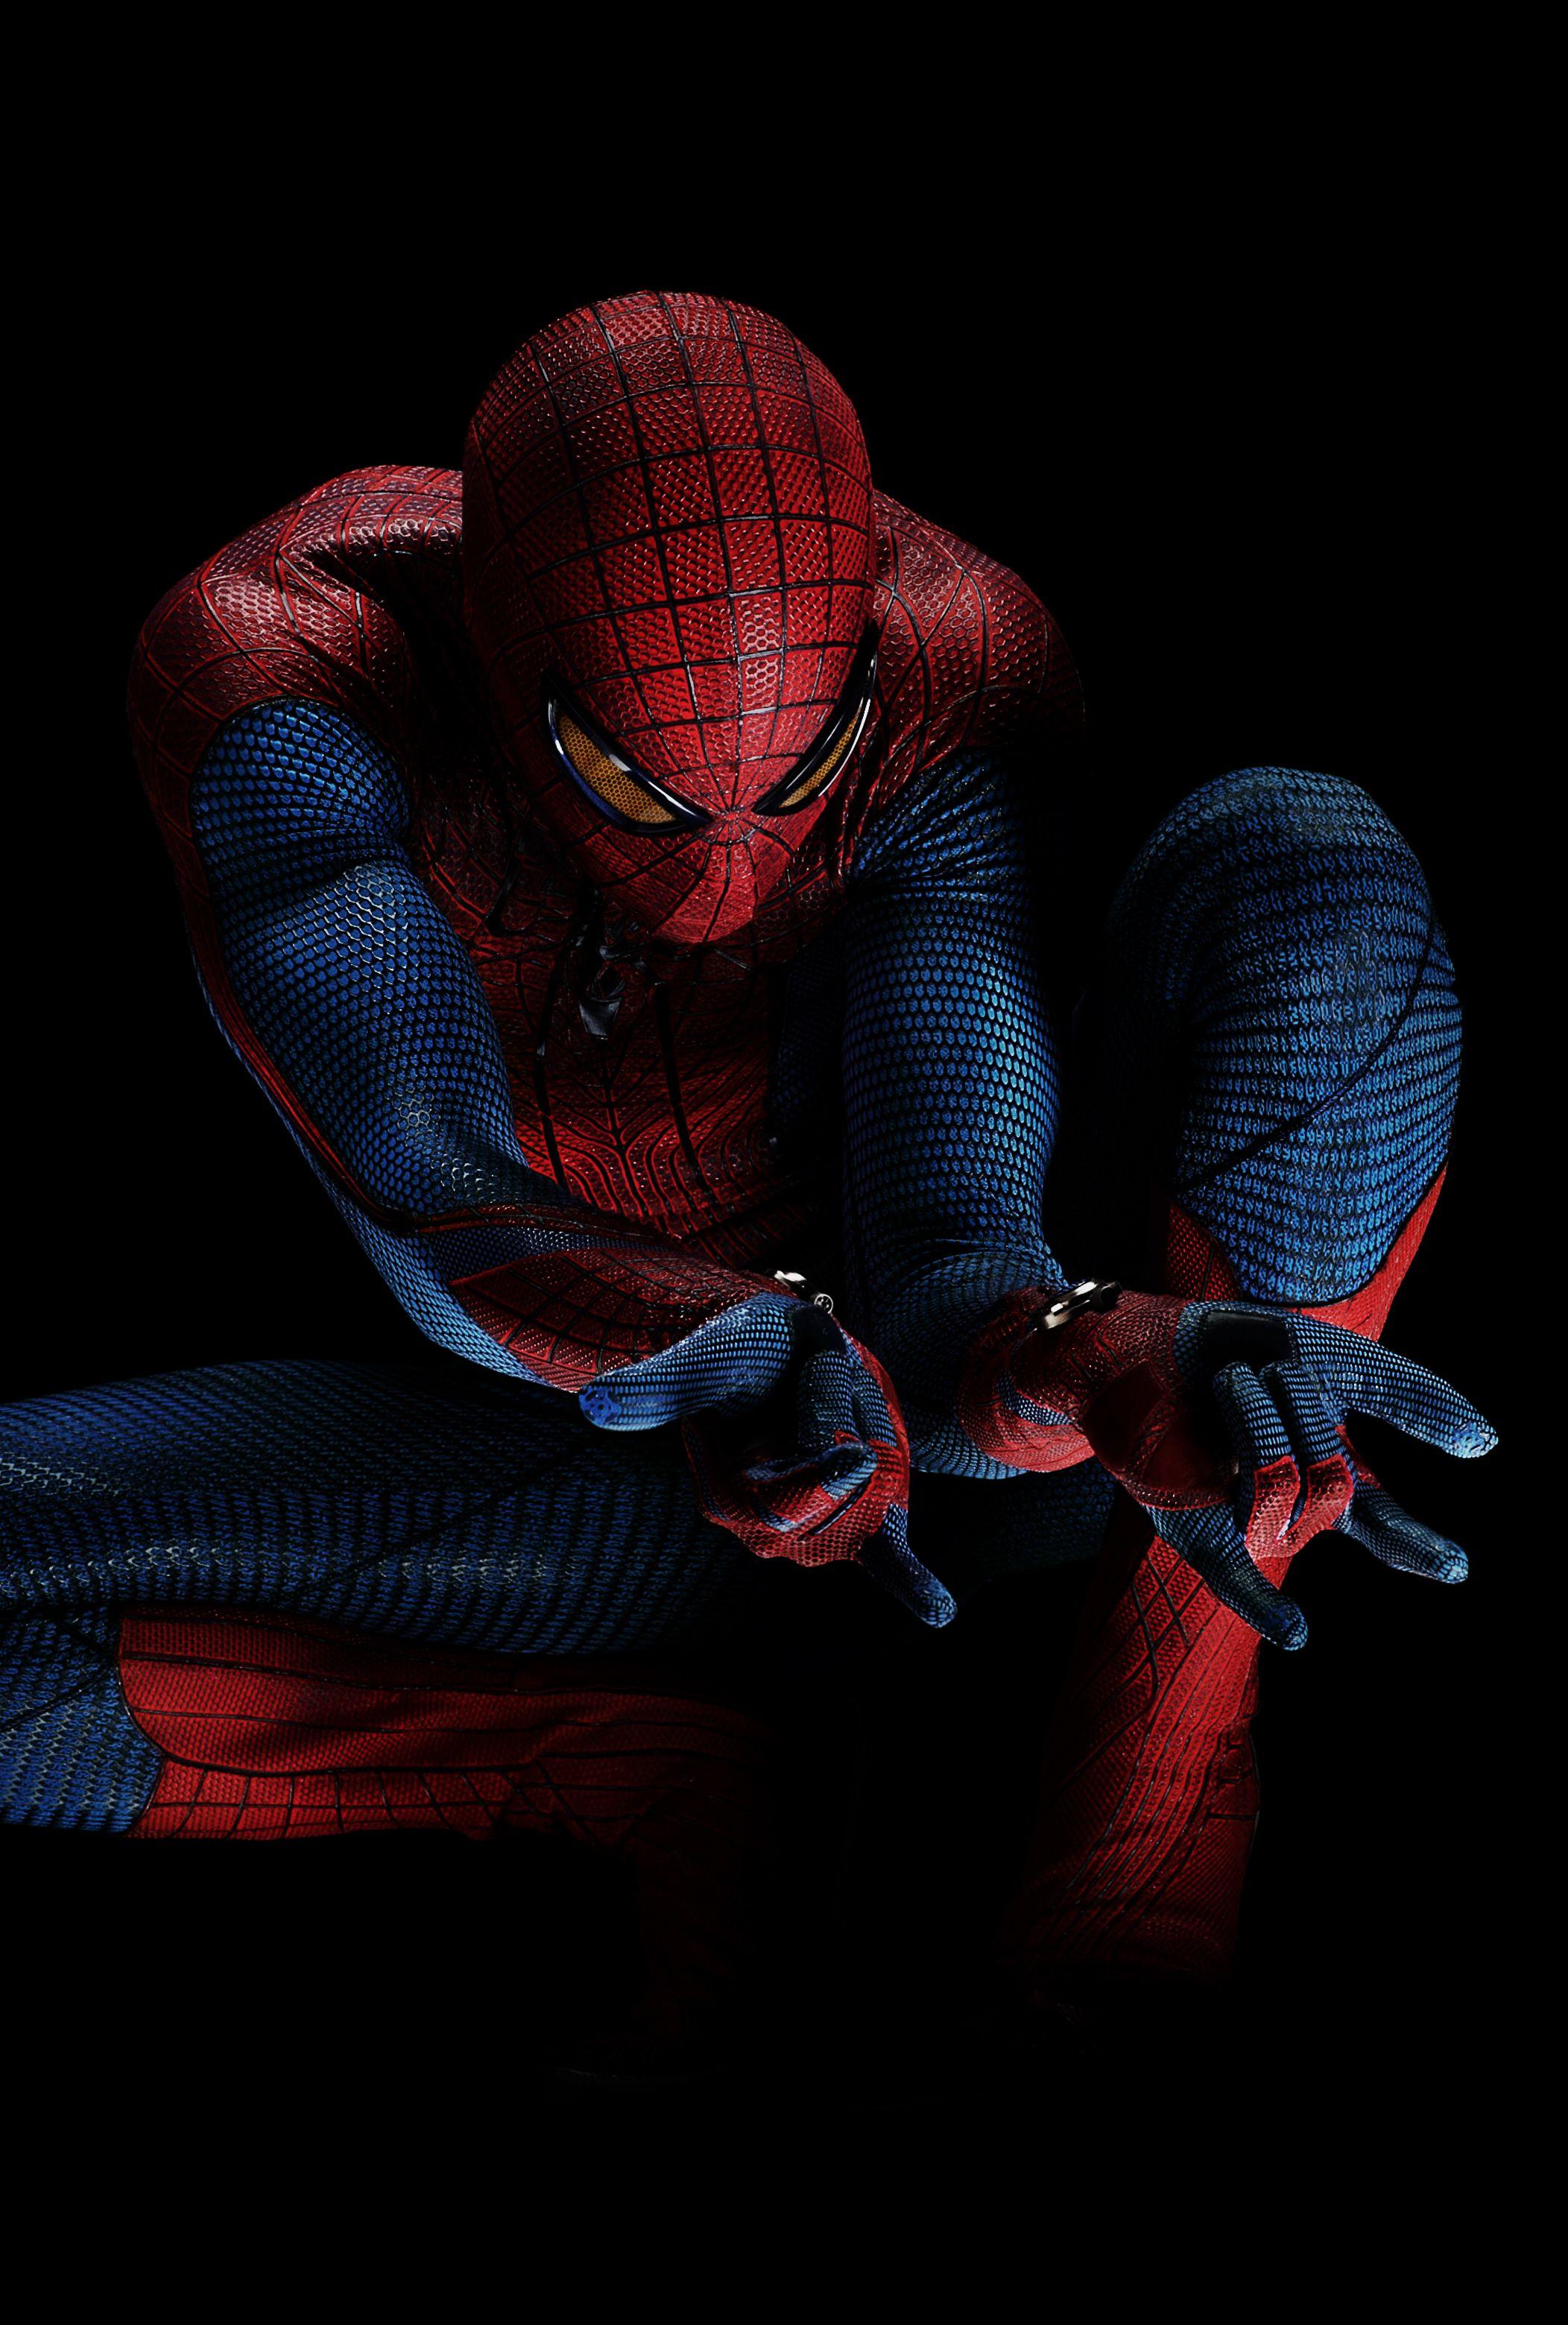 the amazing spider man - photo #21